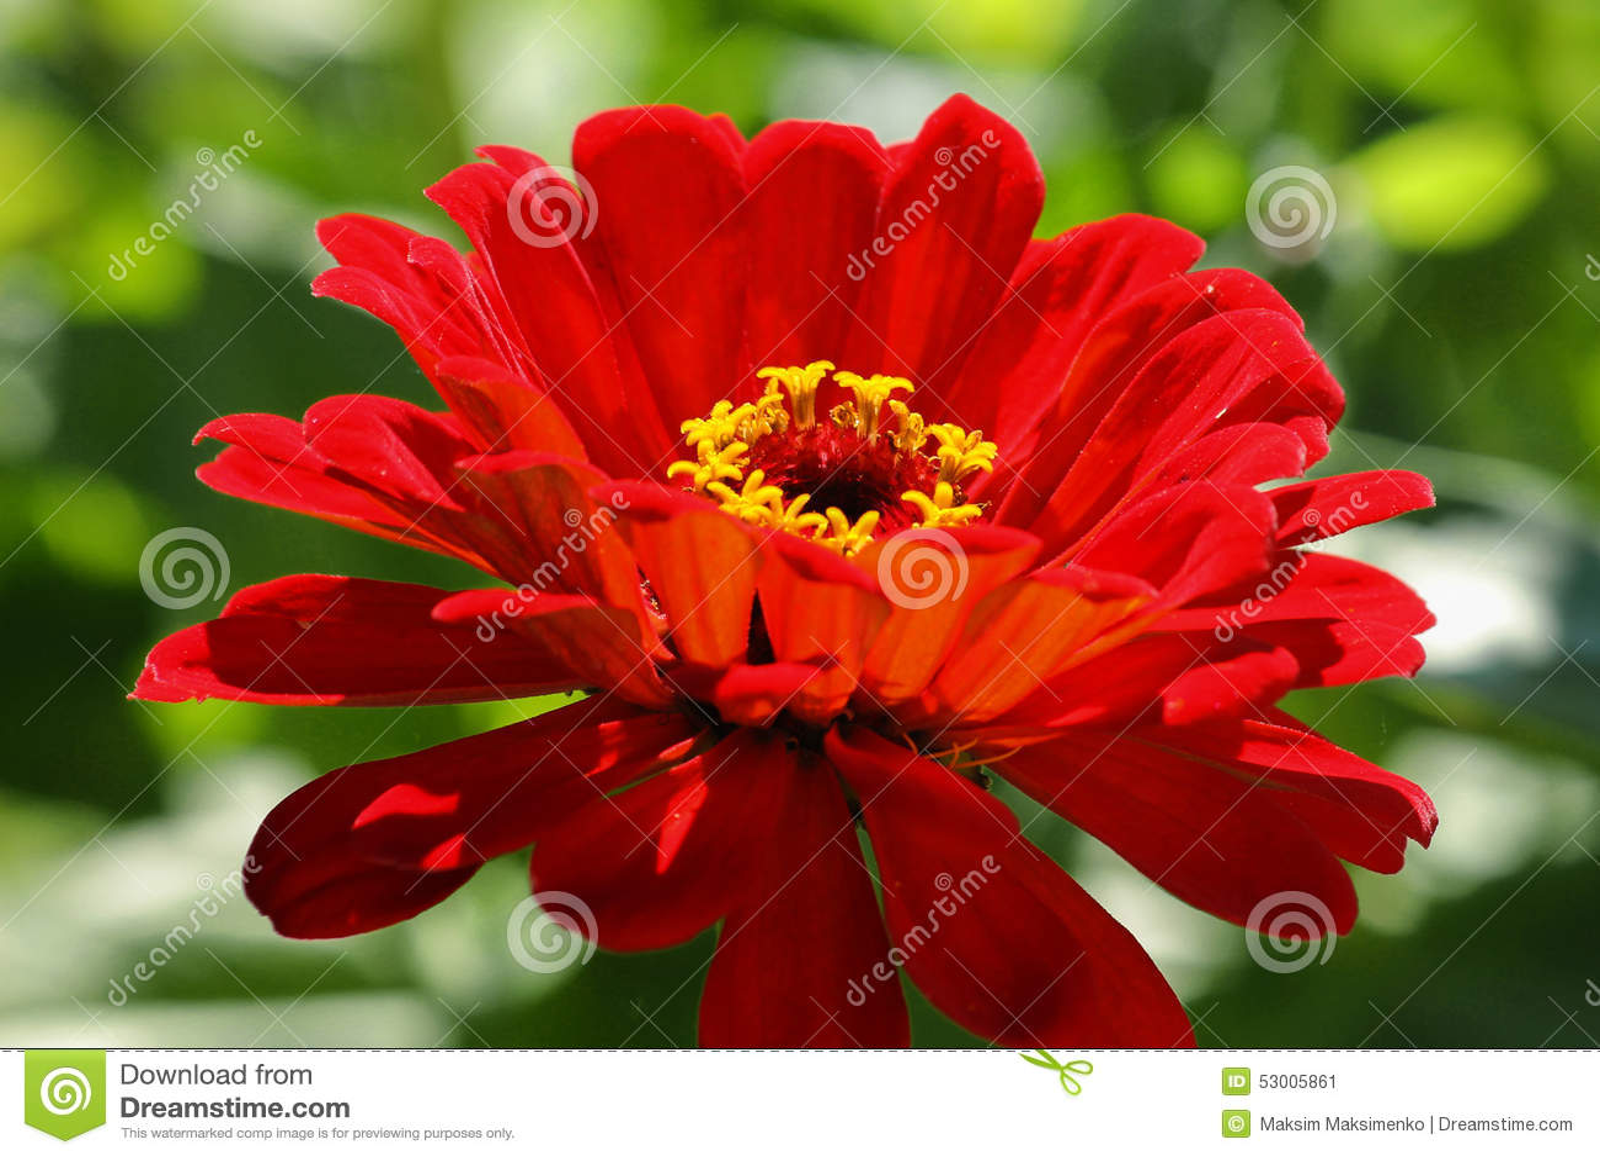 Red flower stock image image of macro petal gerbera 53005861 download comp mightylinksfo